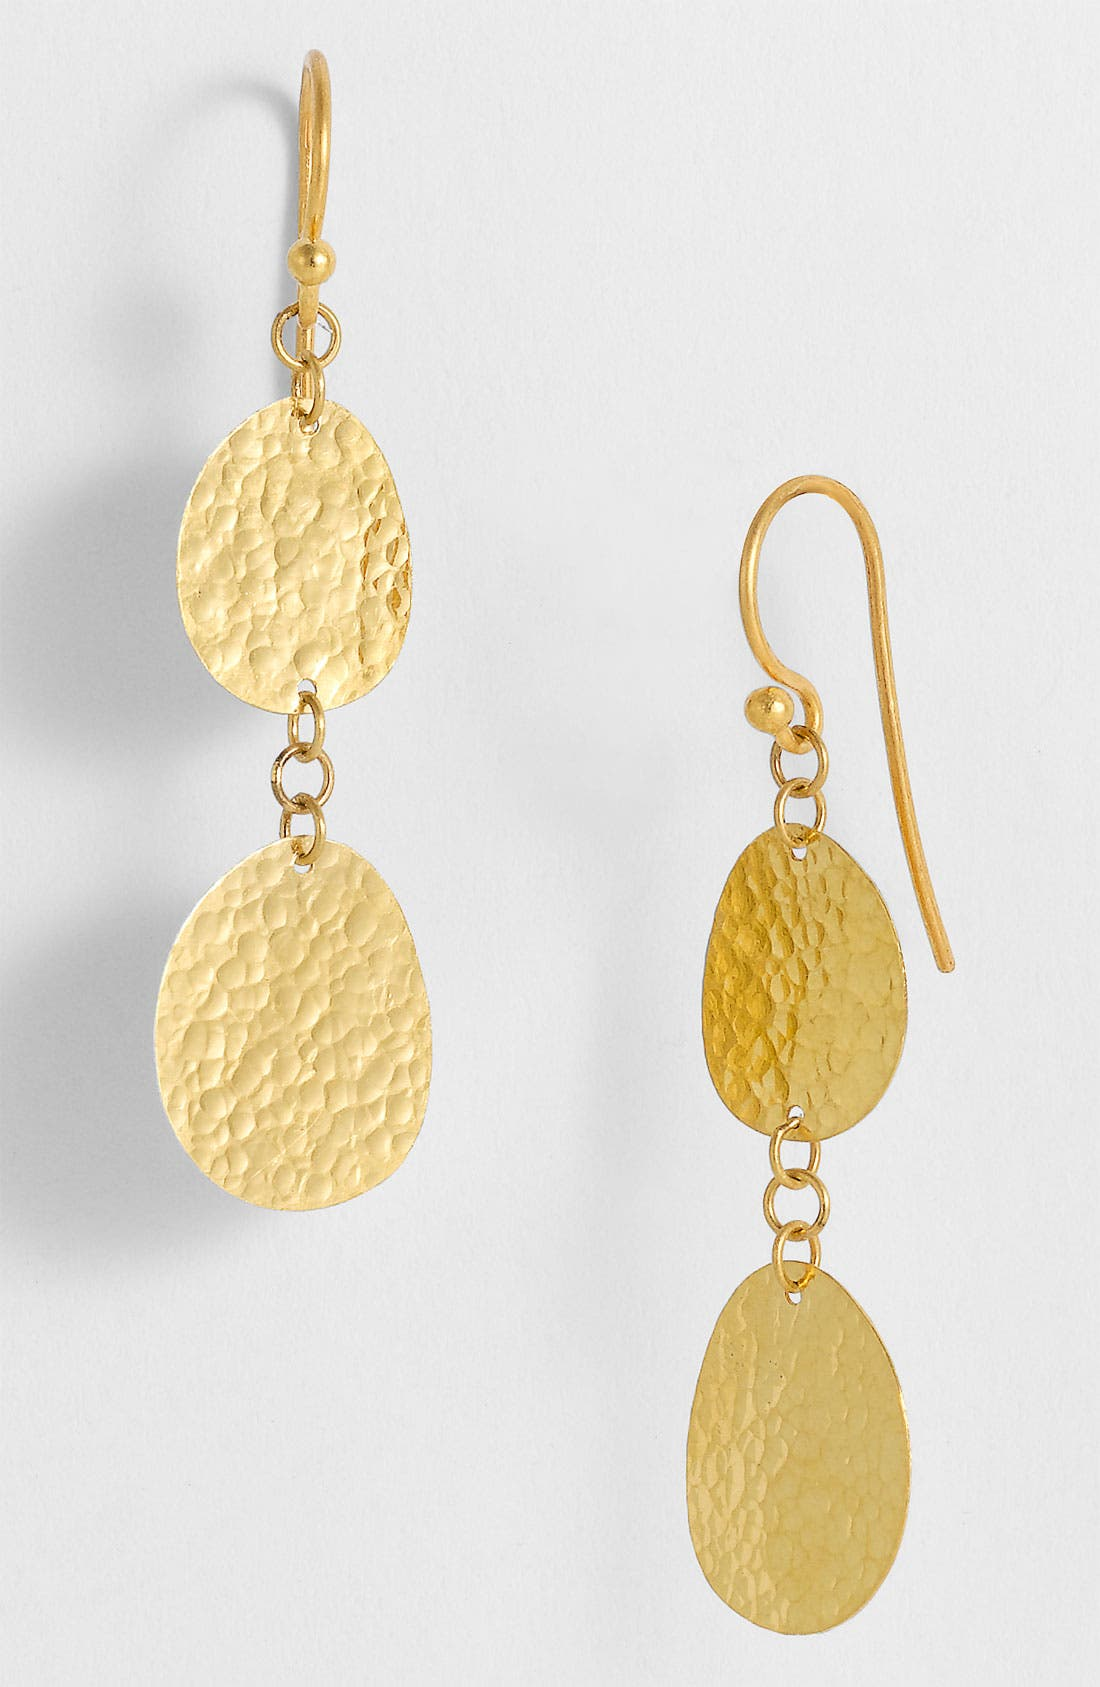 Main Image - Gurhan 'Contour' Double Drop Gold Earrings